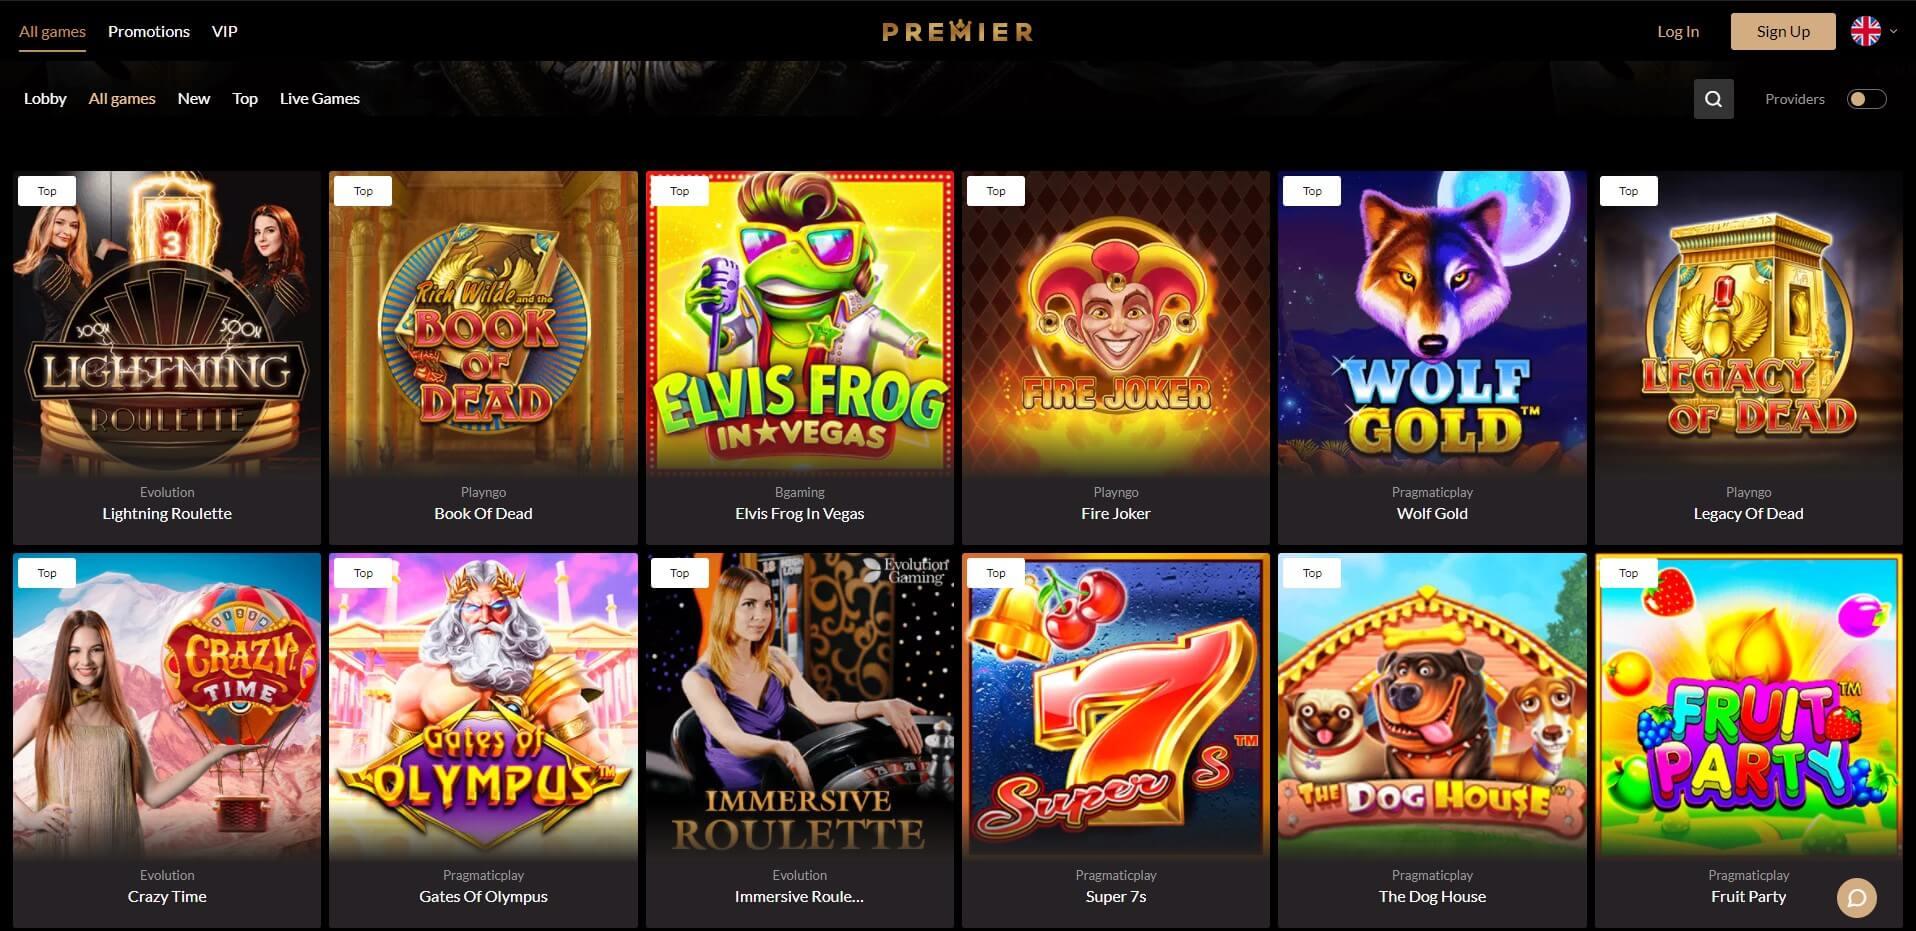 Games at Premier Casino